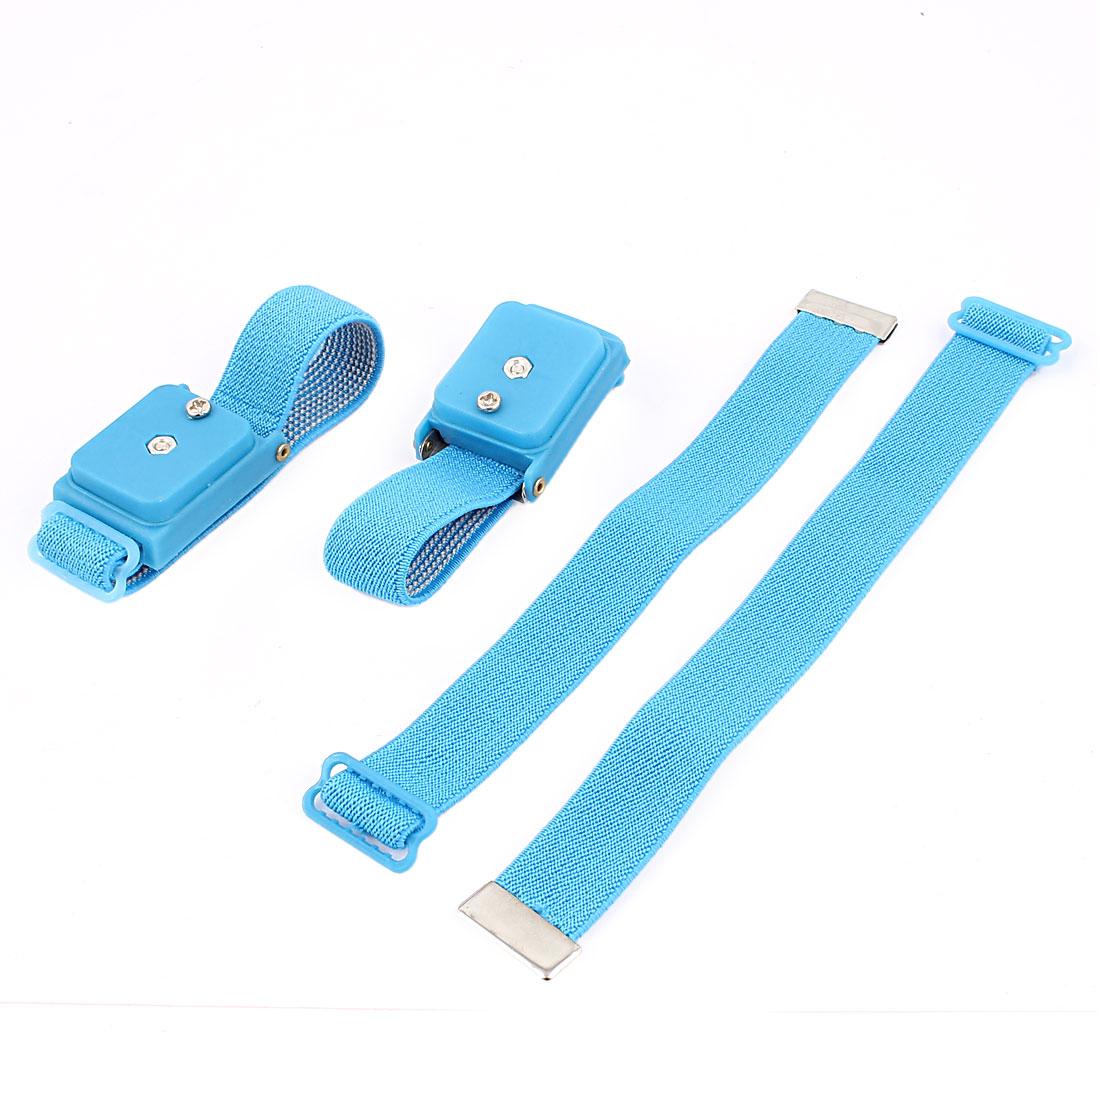 2 Pcs Cordless Stretchy Wristband Anti Static Wireless Wrist Strap Skyblue